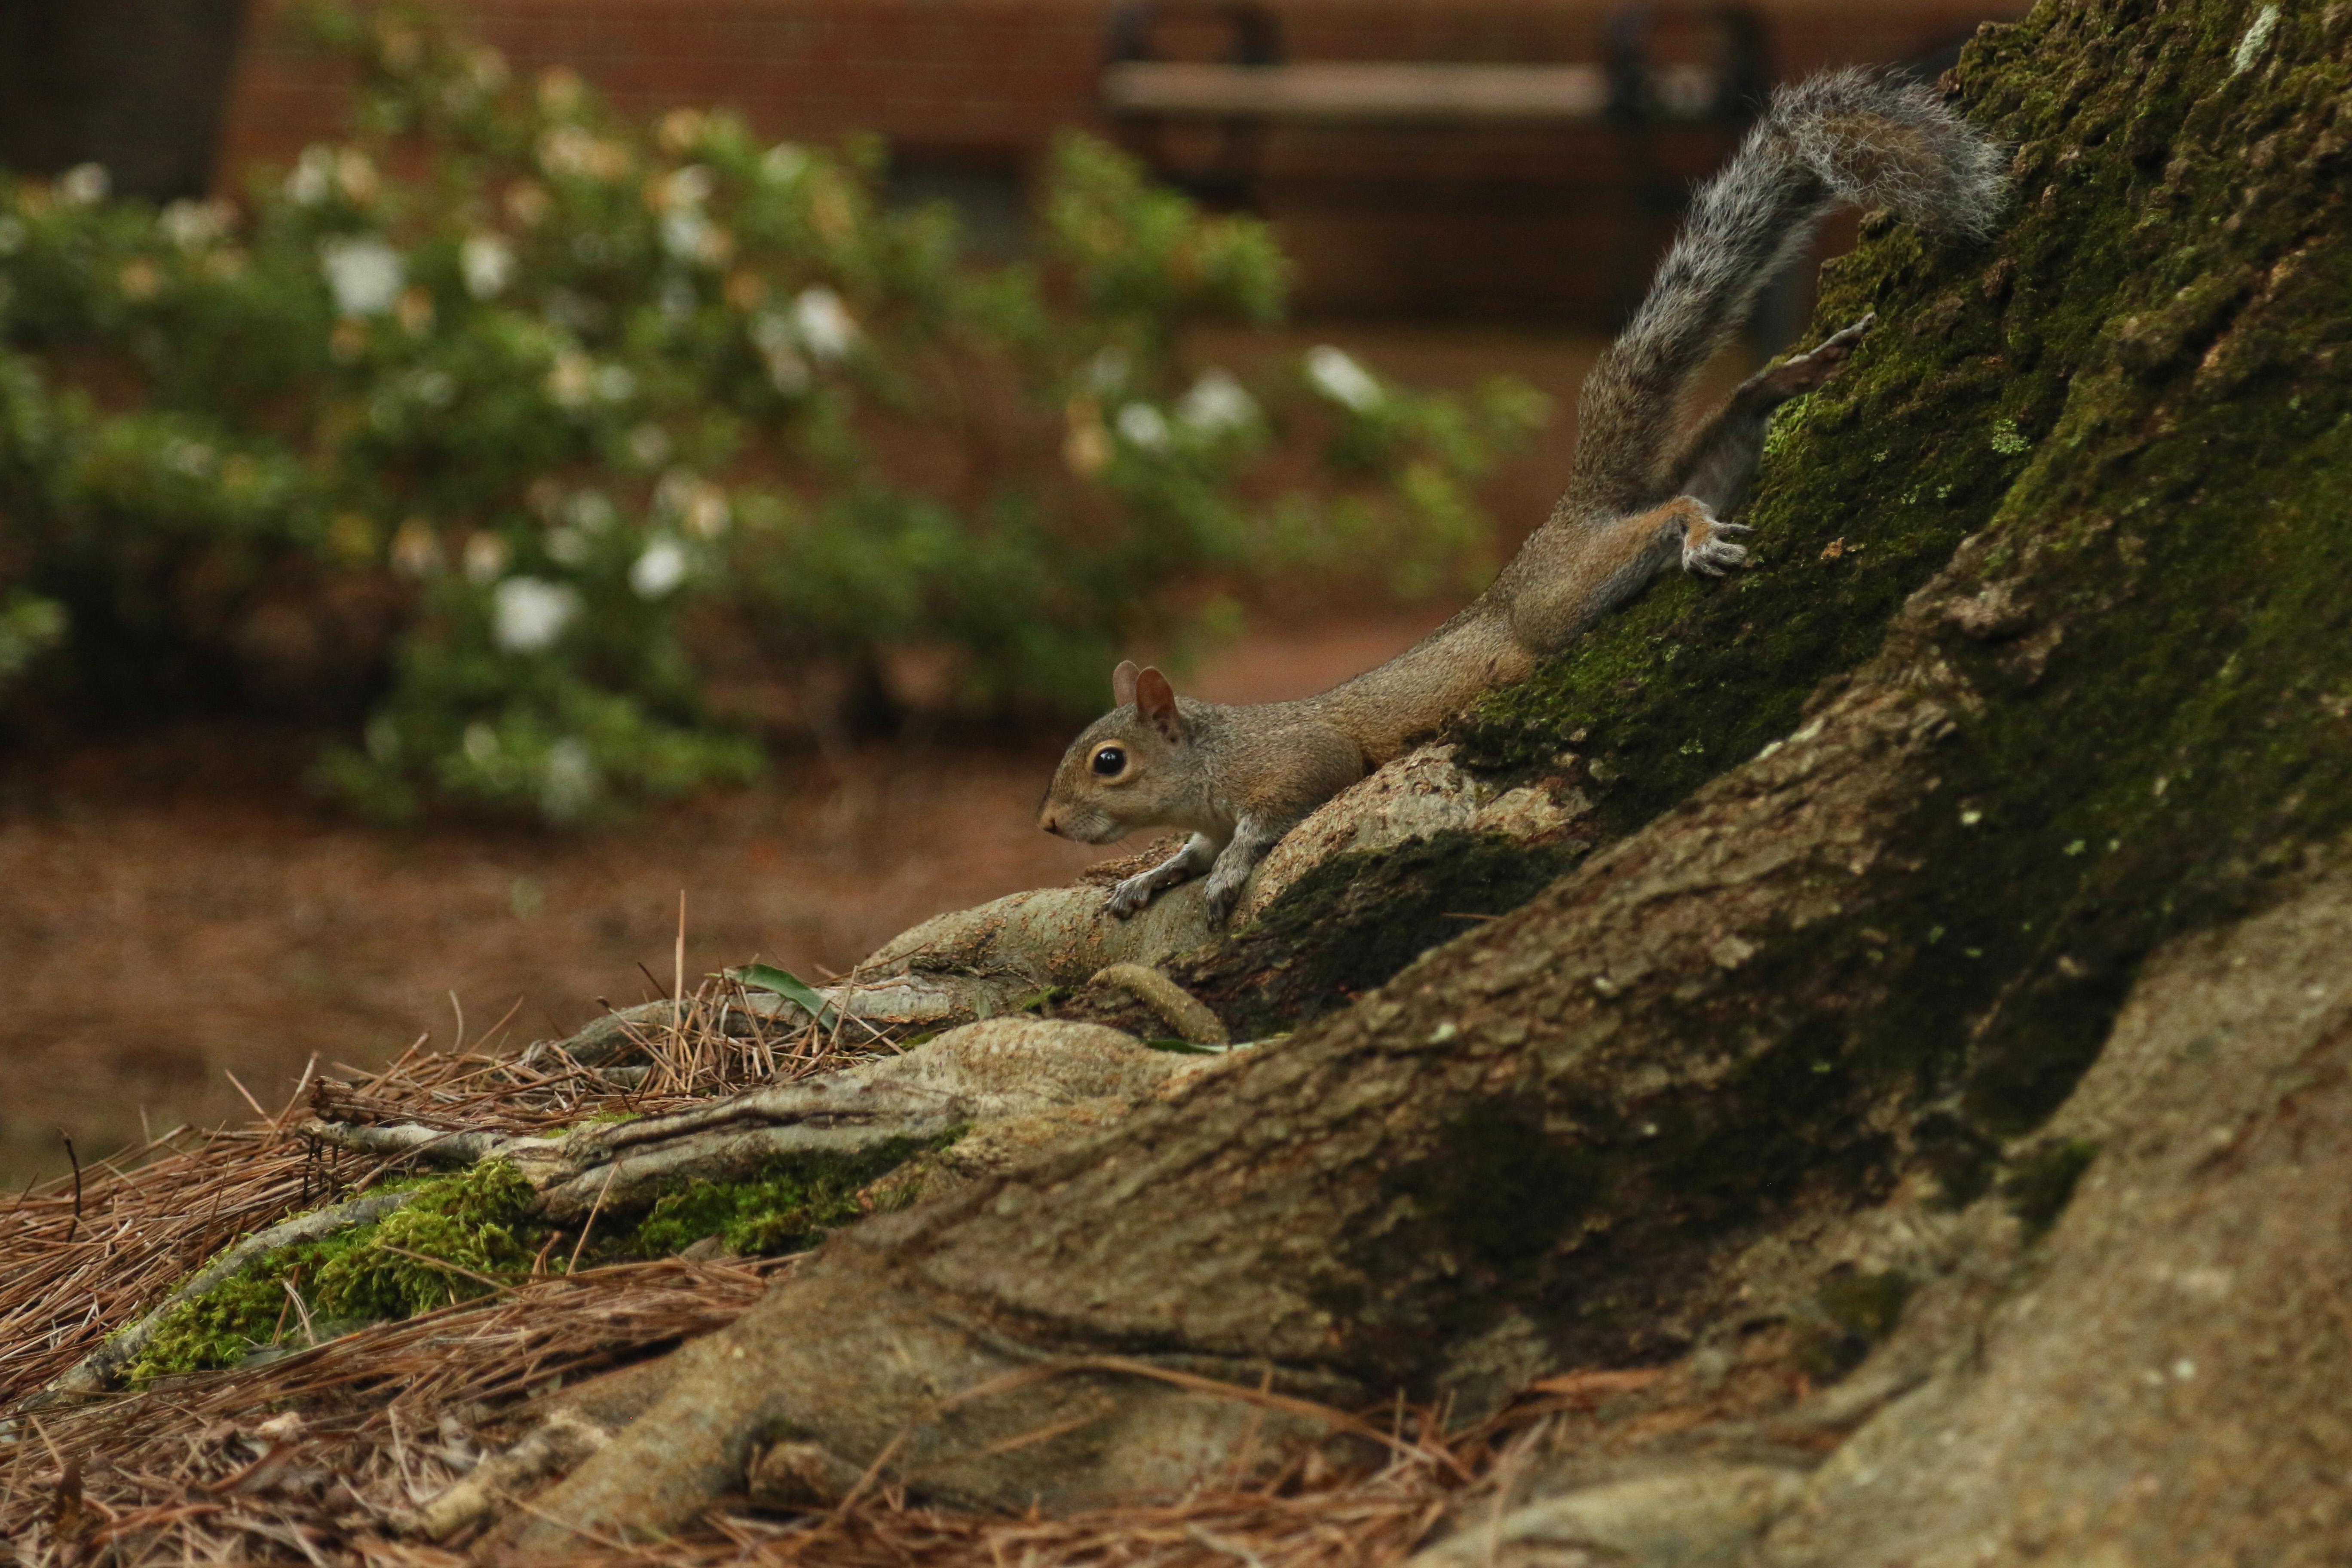 Grey sruirrel on a tree root, in motion